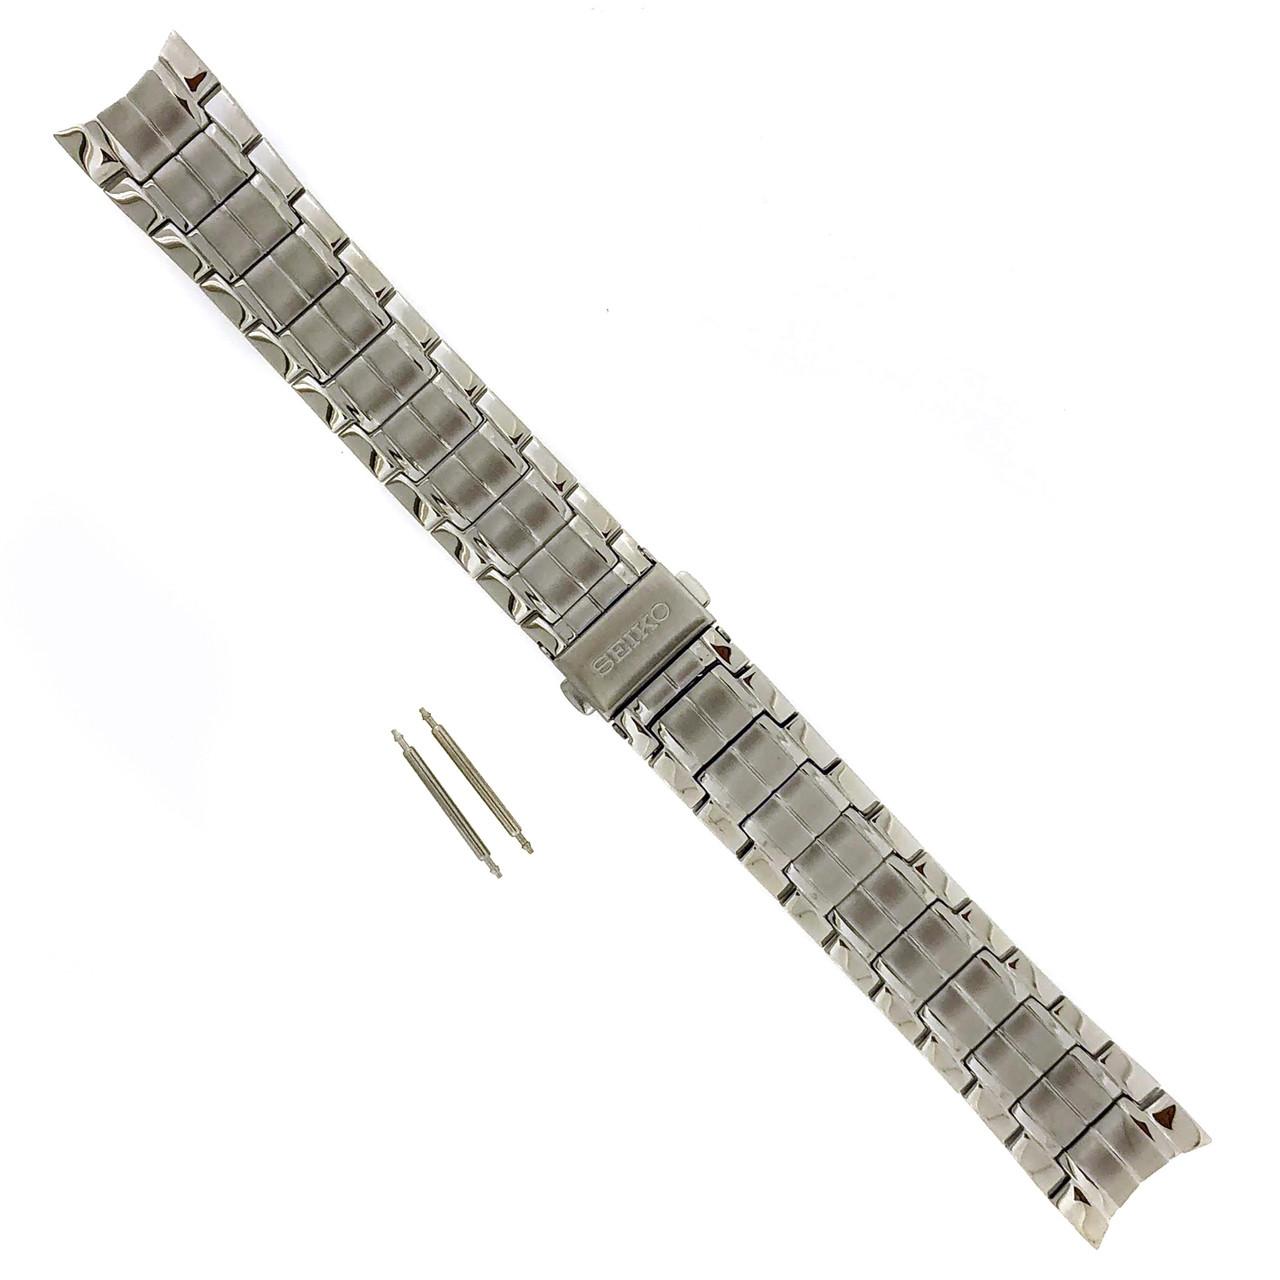 Seiko SNAF11 watchband